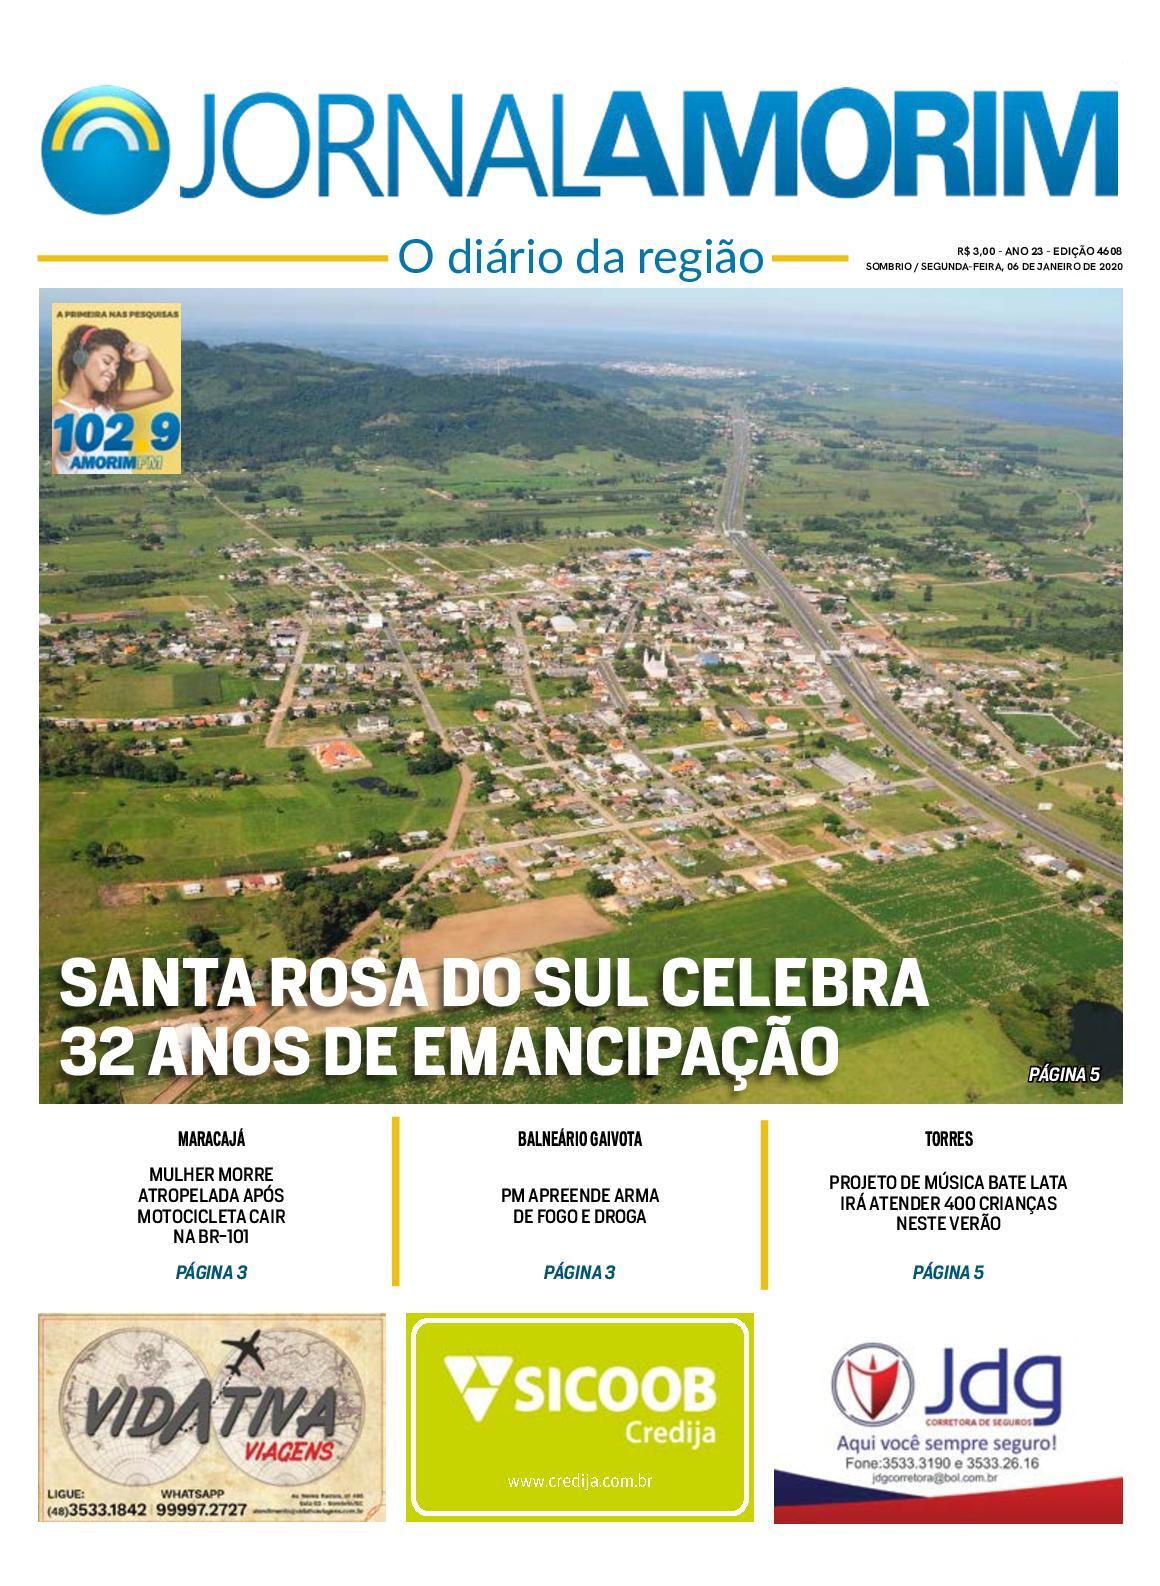 Jornal Amorim 4608 Segunda 06 01 2020